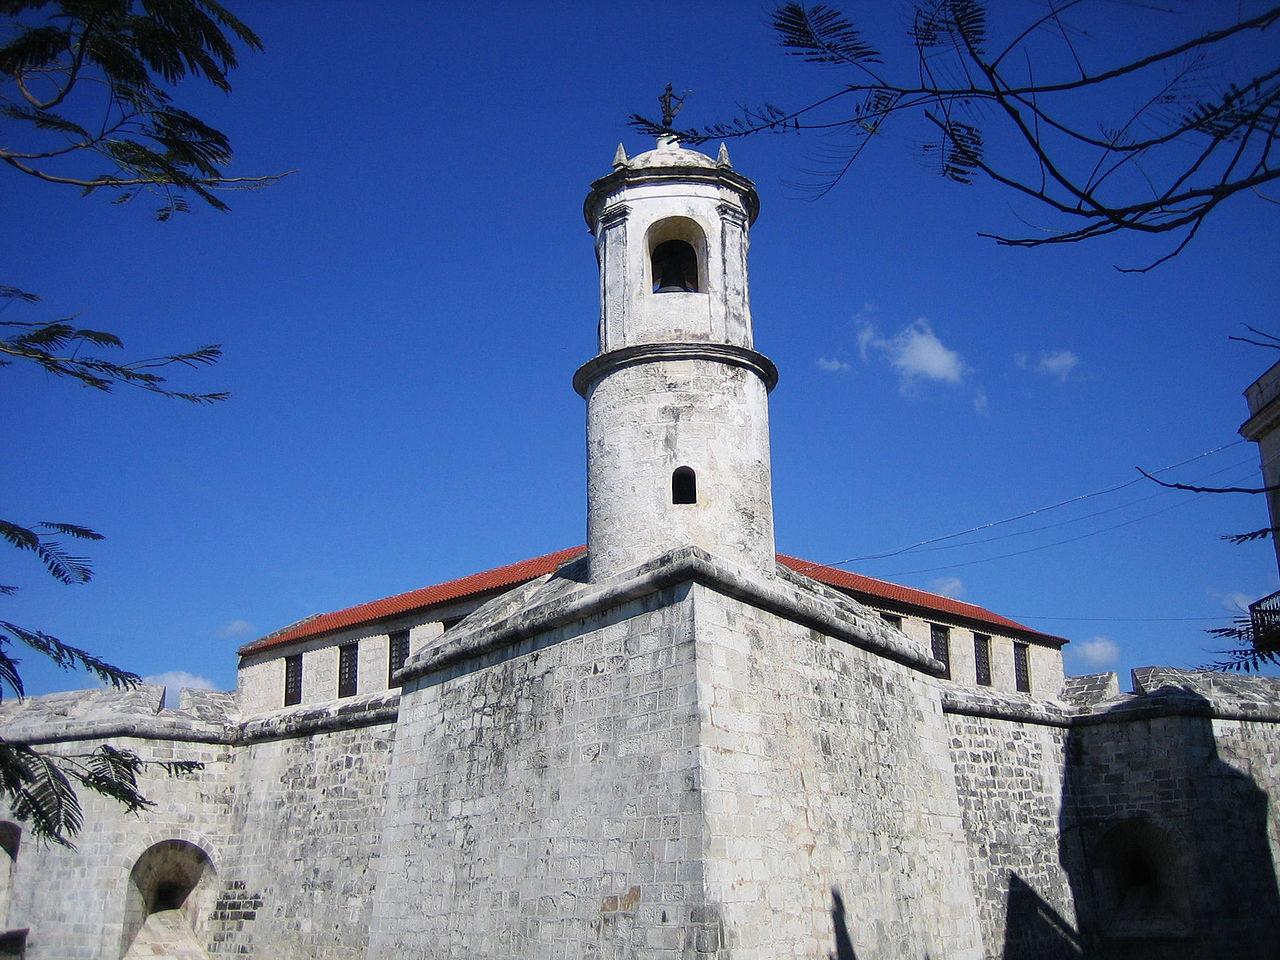 Крепость Ла-Реаль-Фуэрса, сторожевая башня